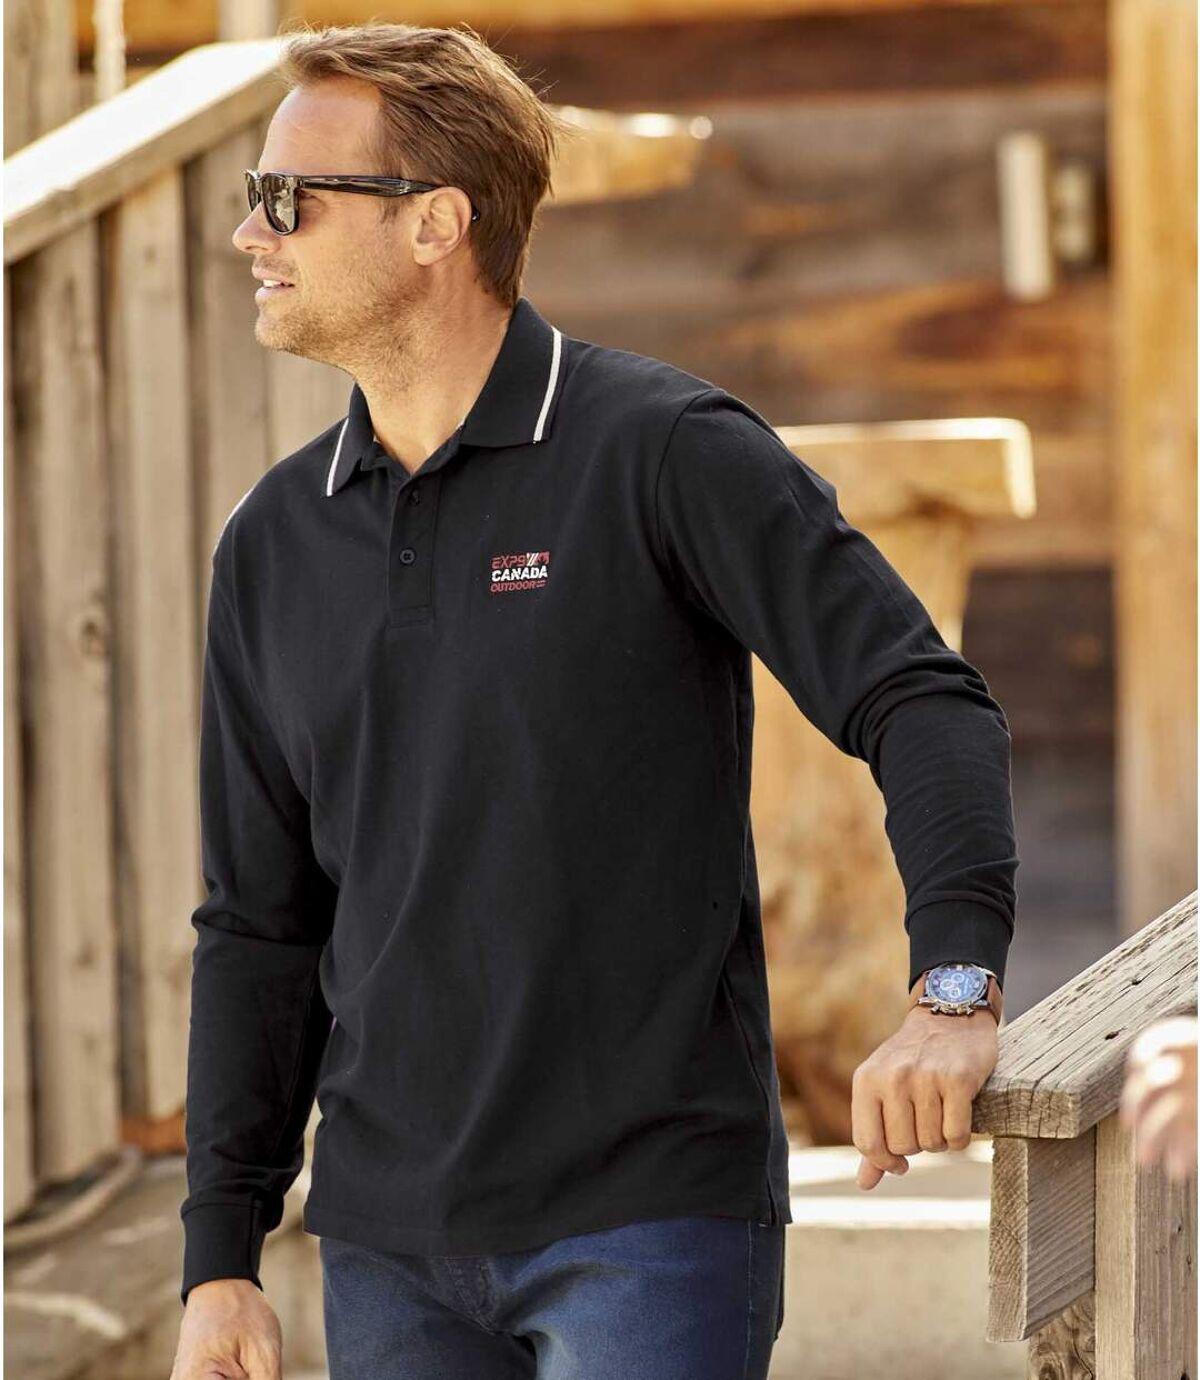 2er-Pack Poloshirts Canada in Piqué-Qualität Atlas For Men